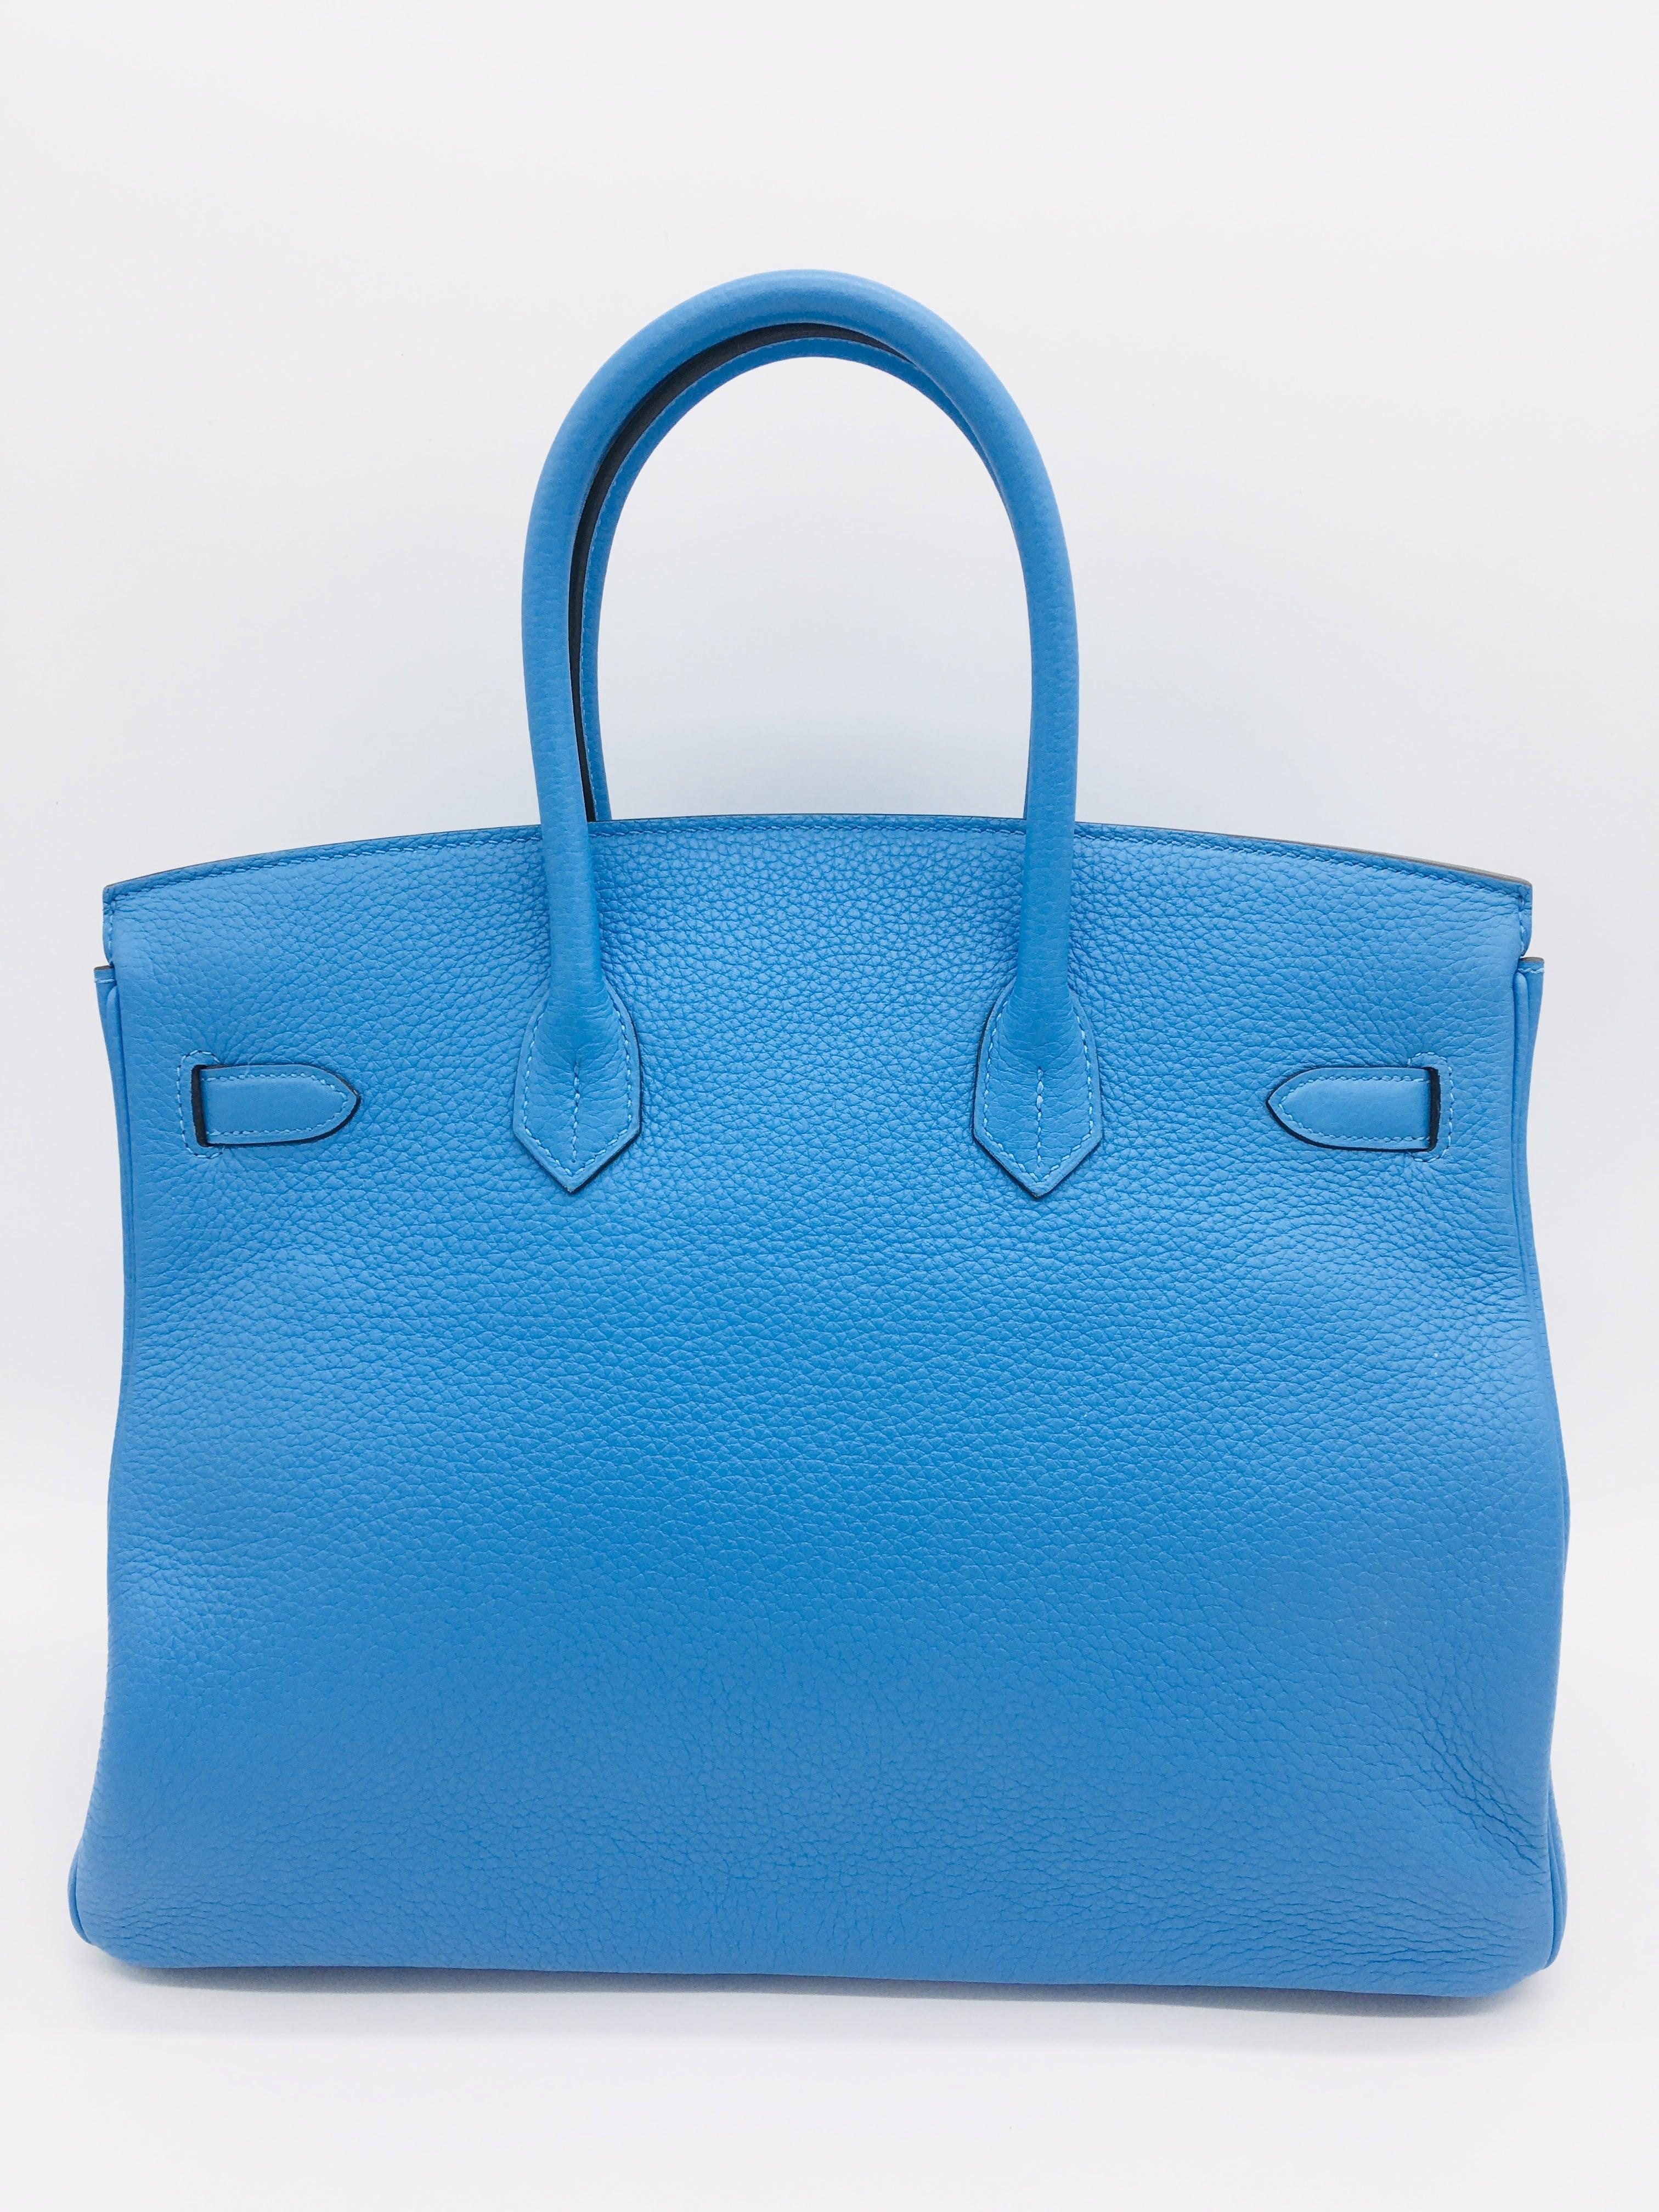 8cf8353029 Hermes Bleu Paradis Birkin 35cm in Clemence For Sale at 1stdibs